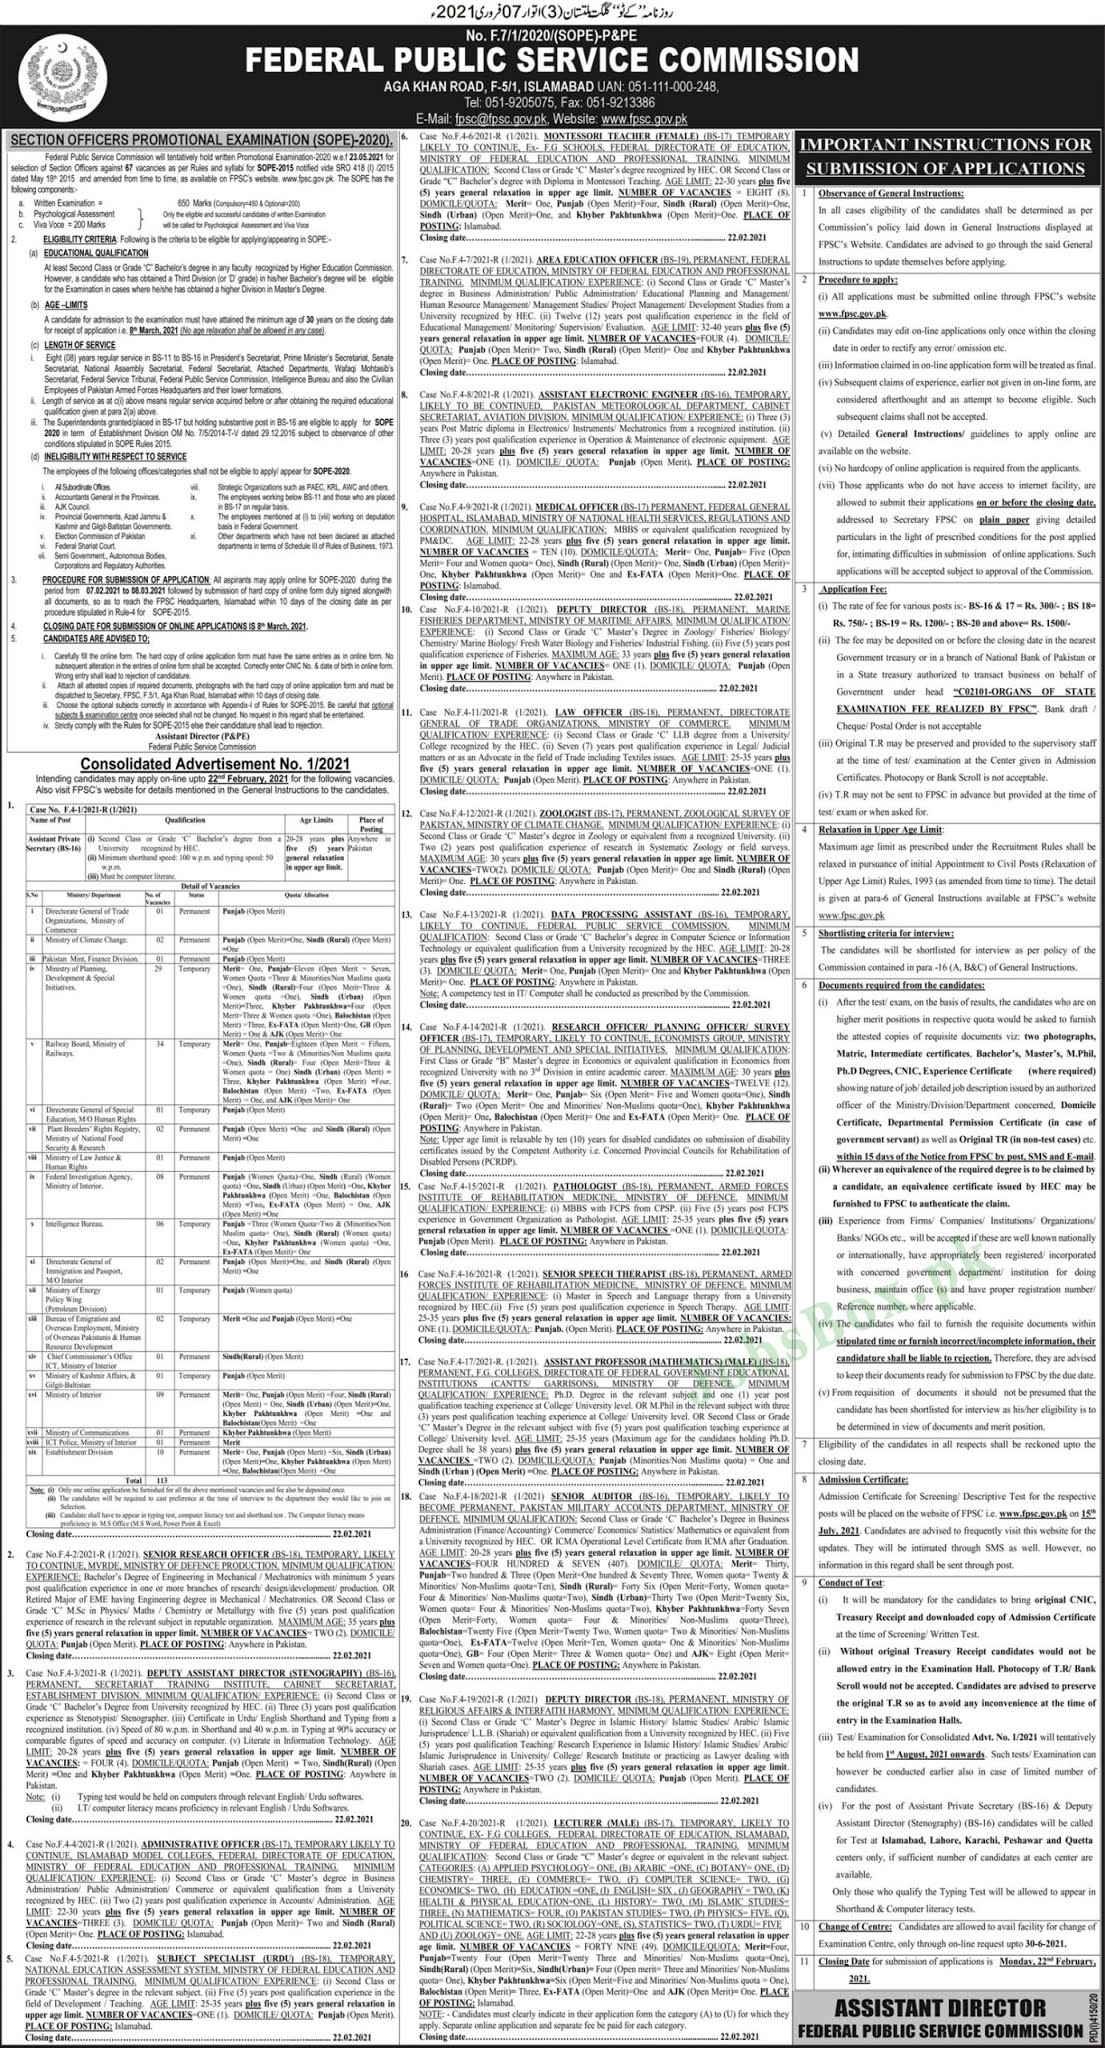 FPSC jobs 2021 Advertisement | Govt Jobs 2021 Pakistan - thejobs365.com